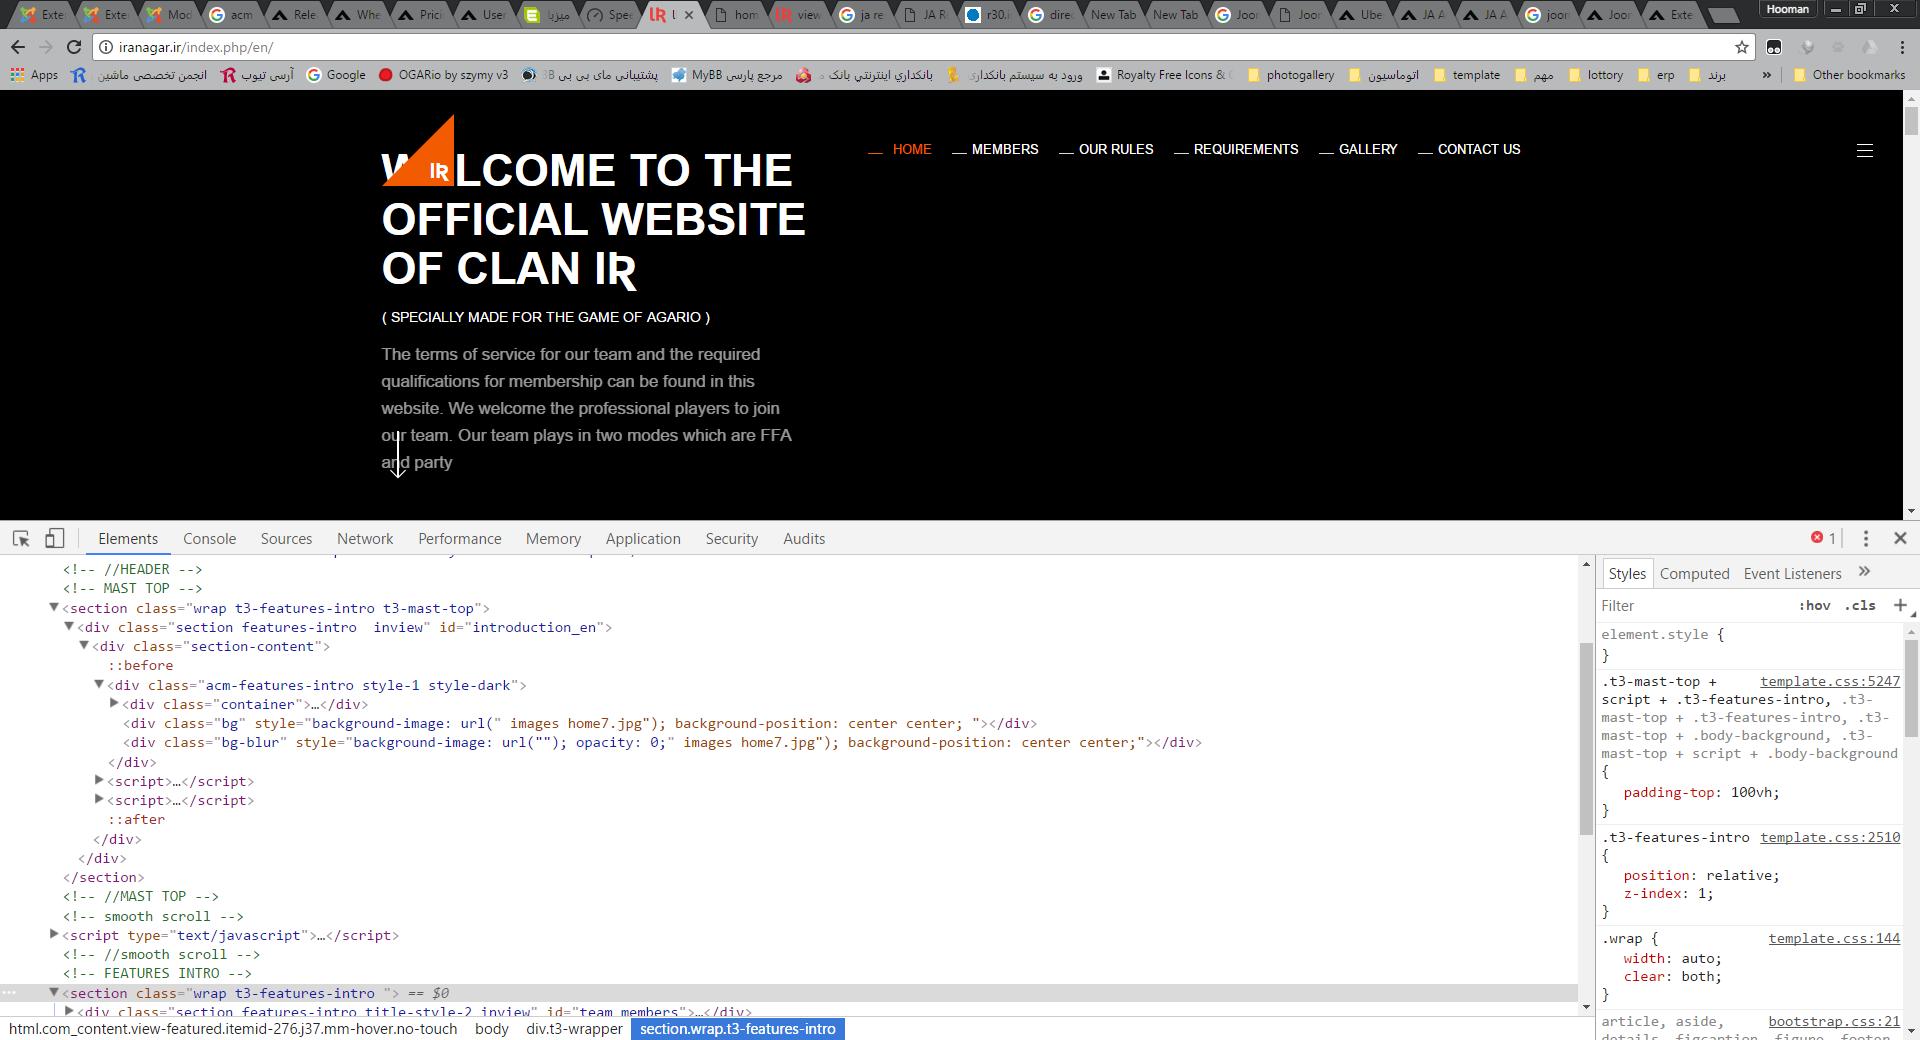 joomla advance custom module problem with joomla 3.7.2 - JoomlArt